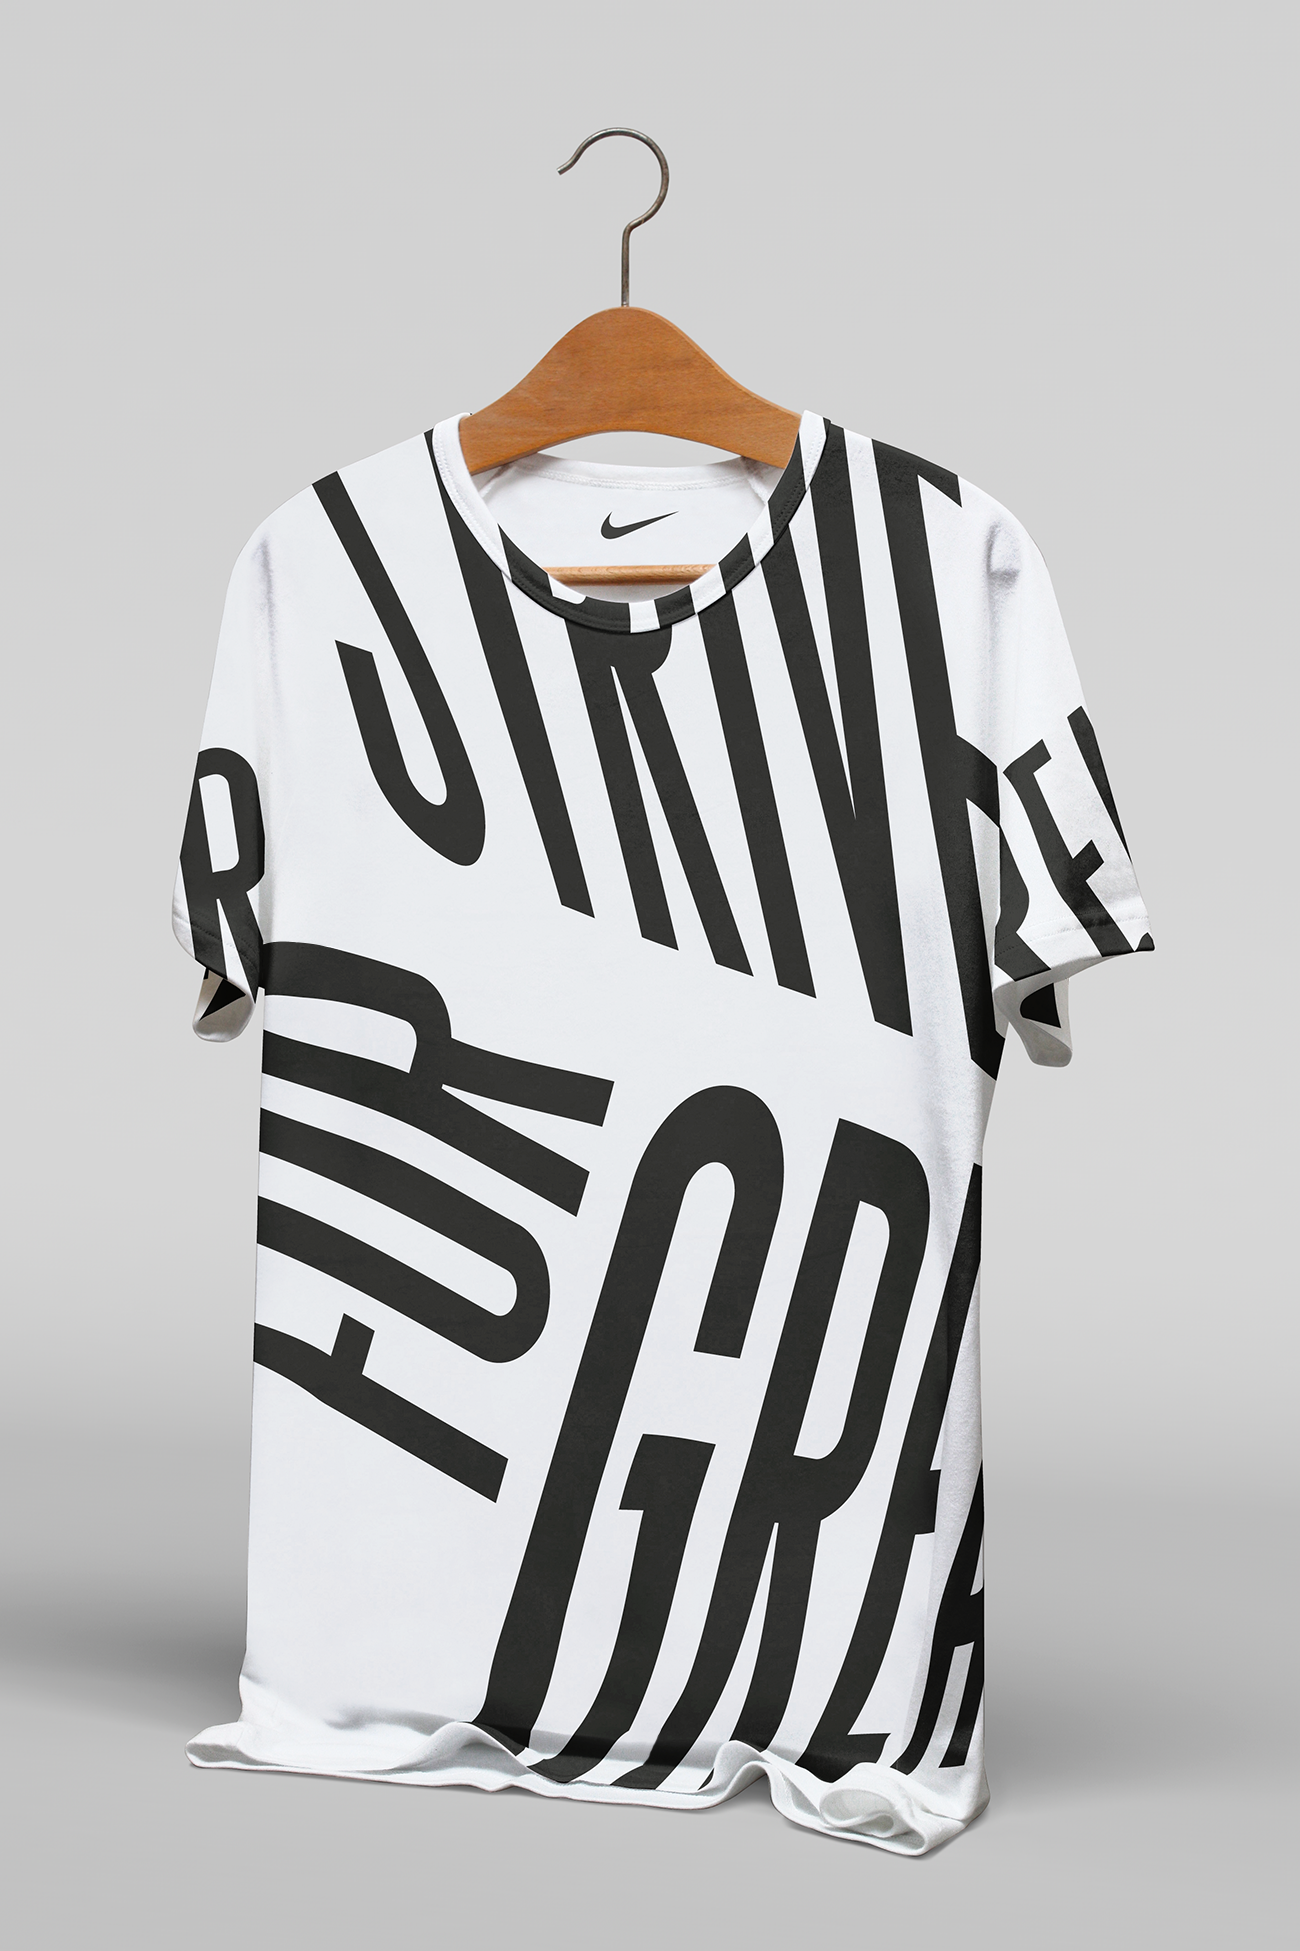 Design t shirt nike - Url